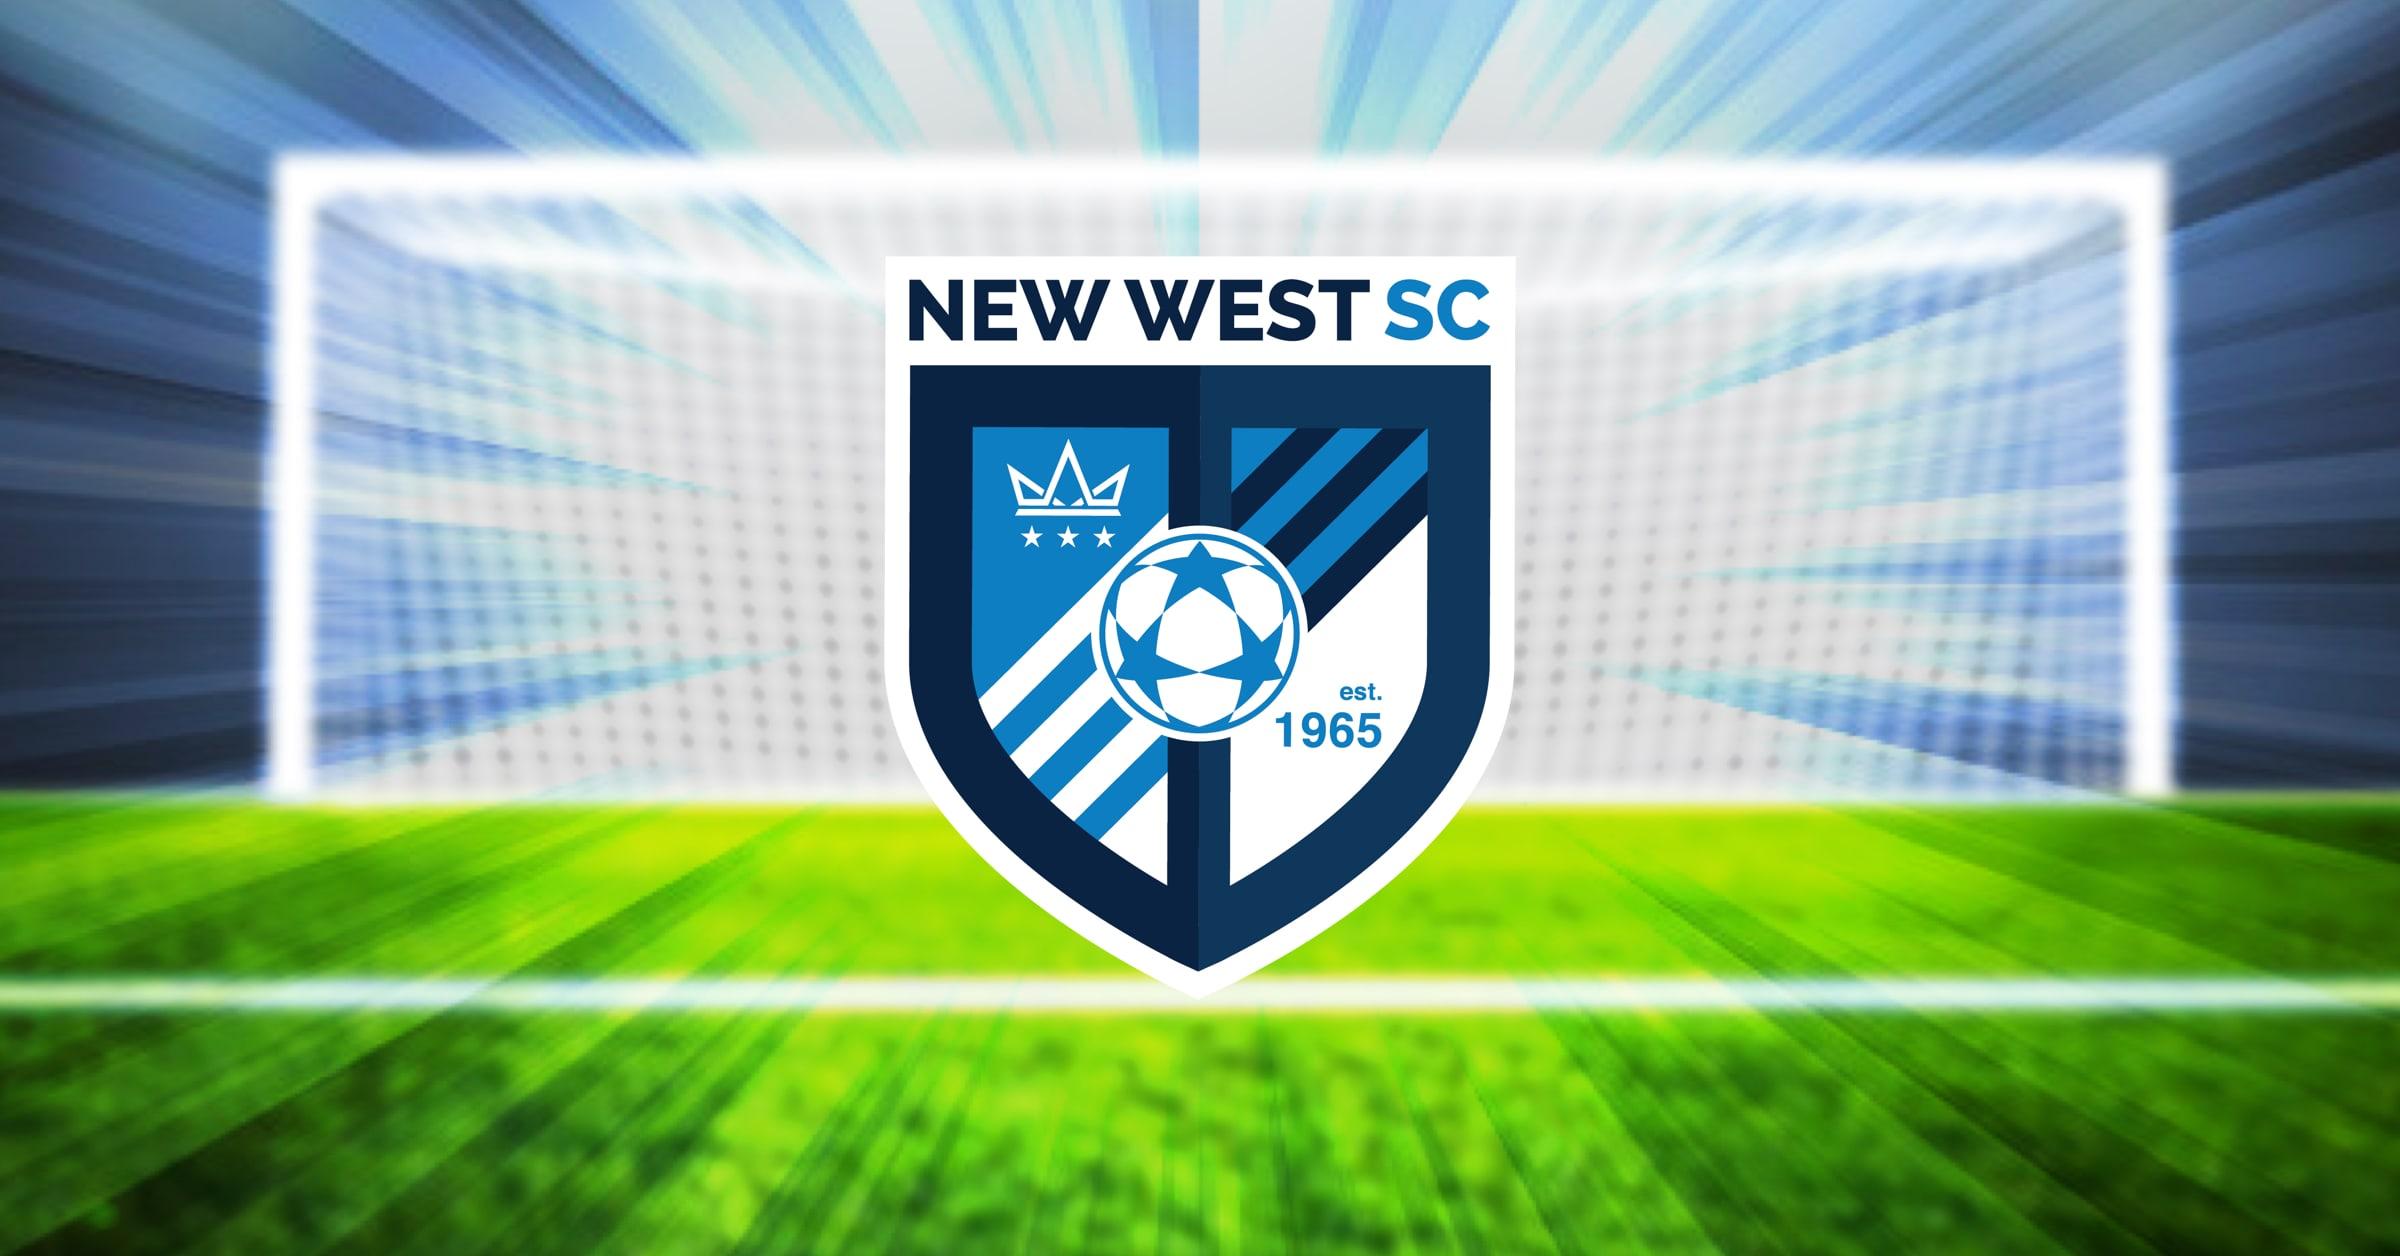 New West Soccer Club